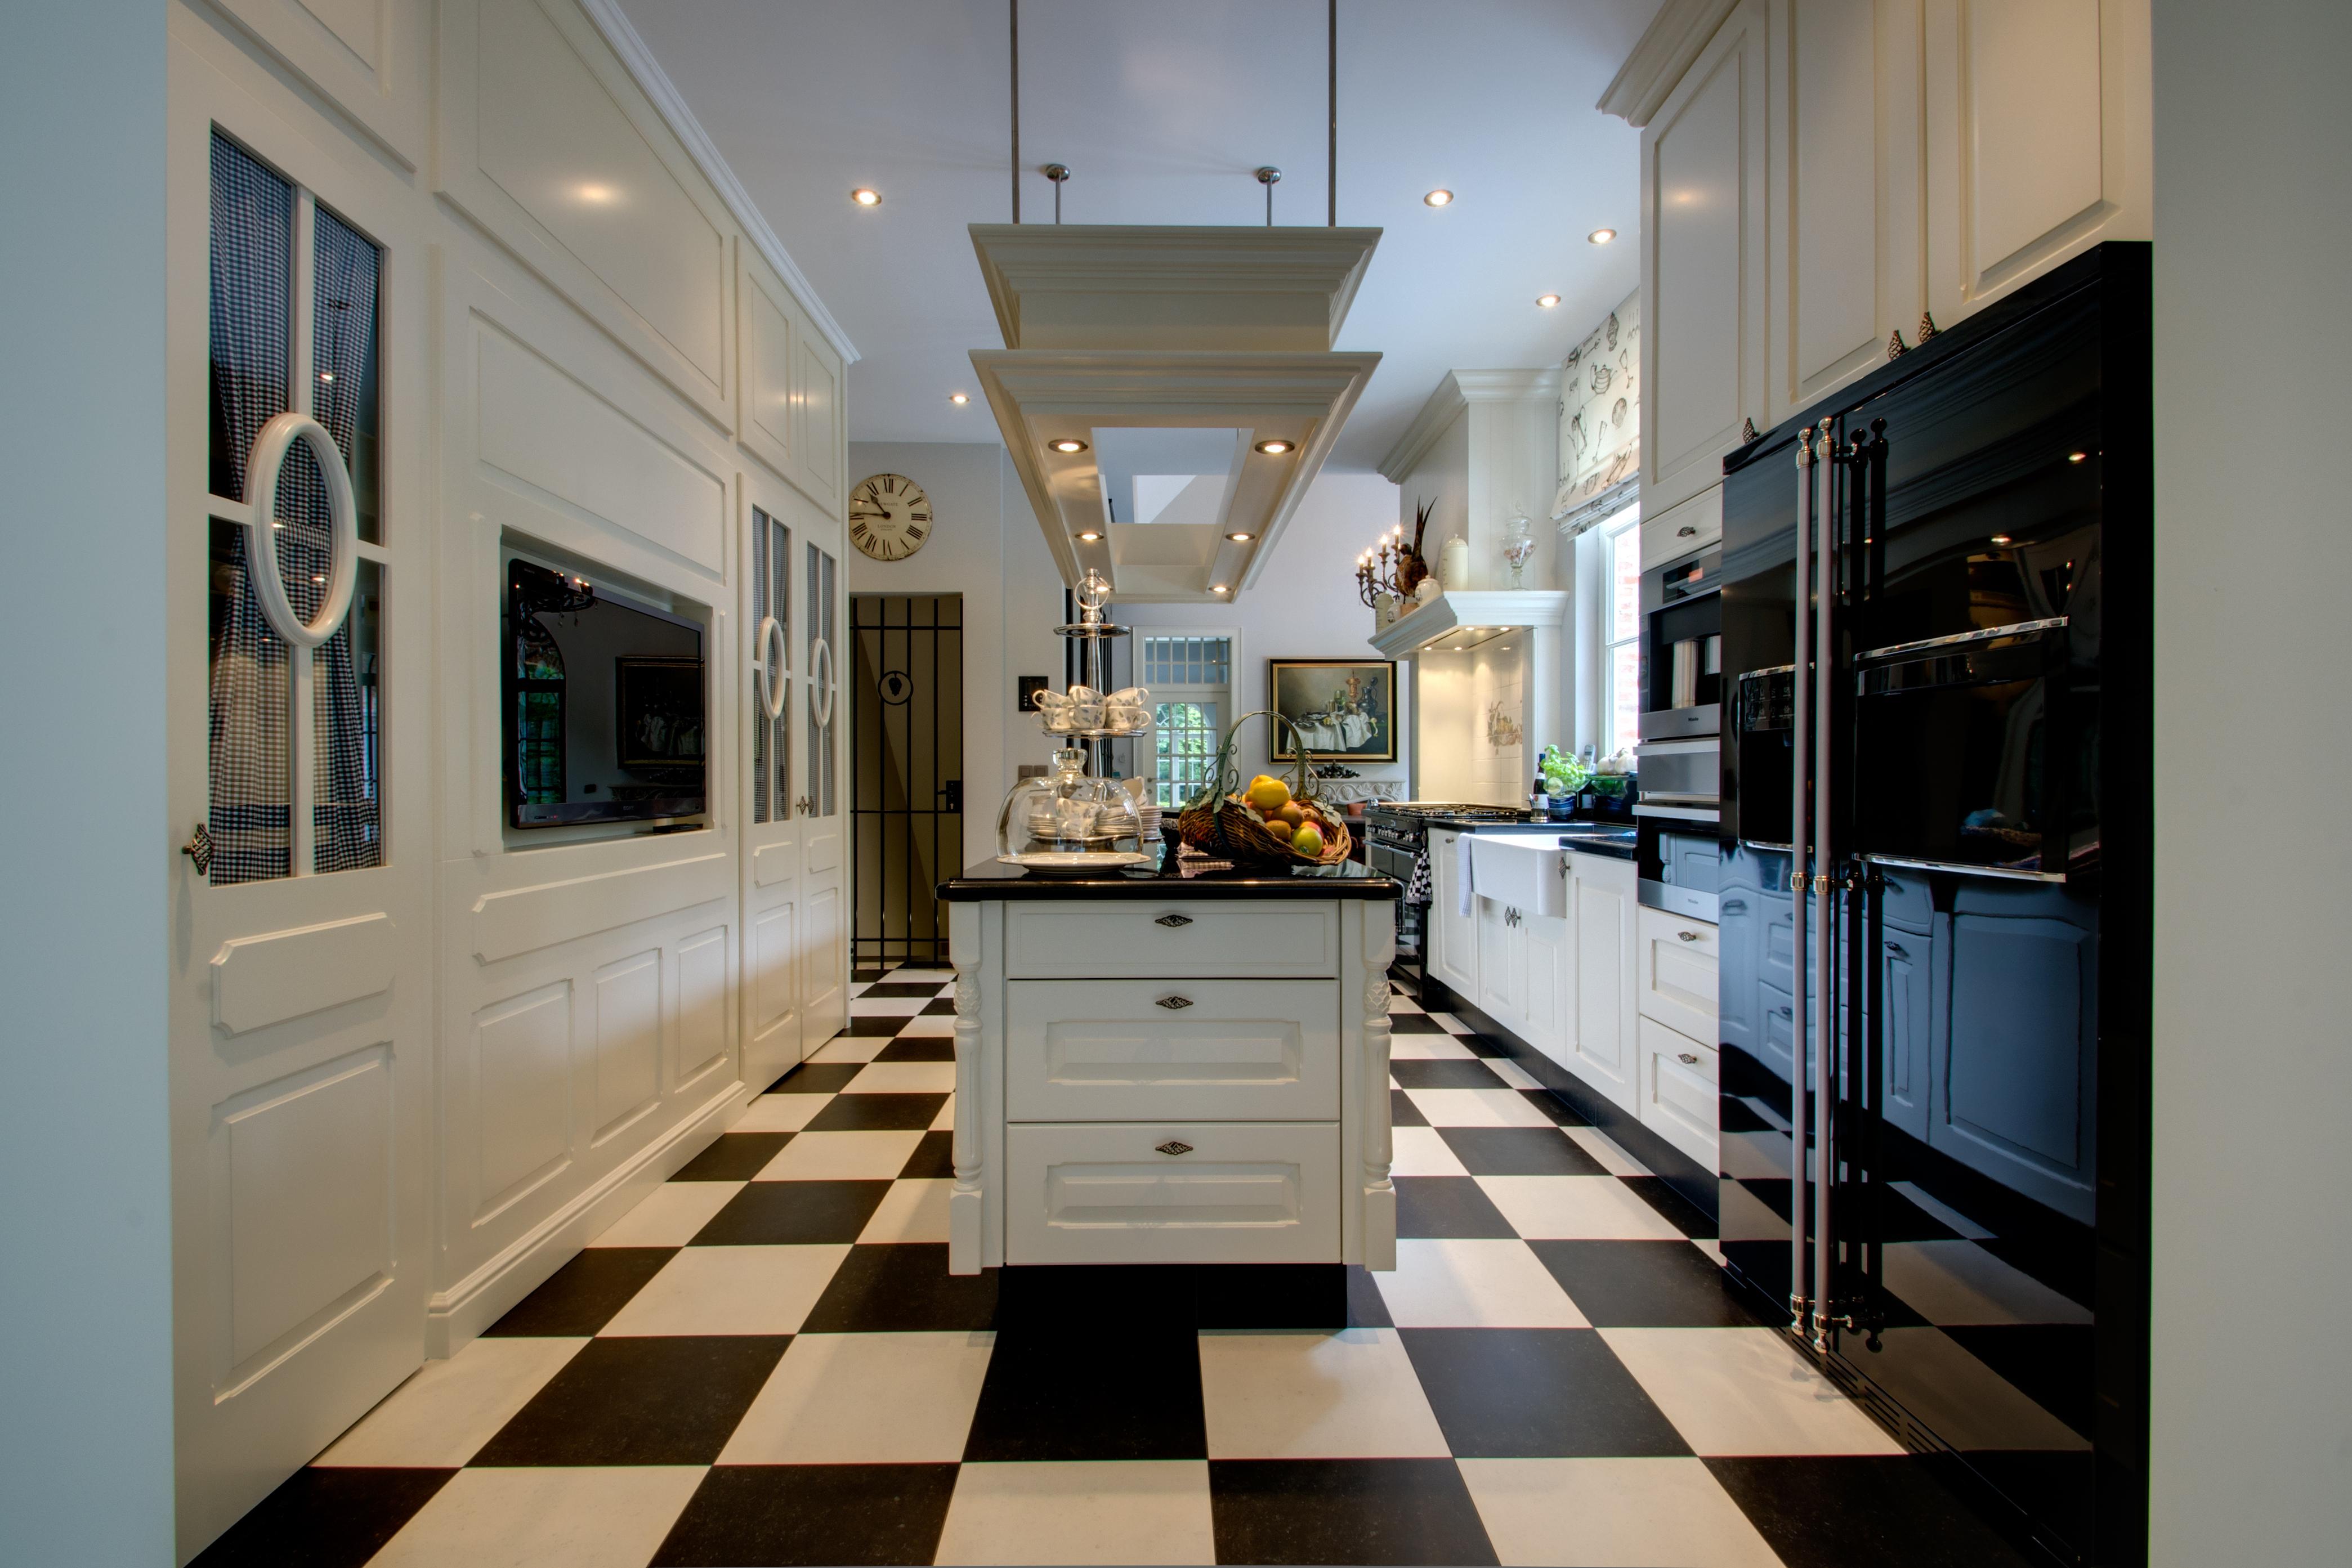 06_keuken